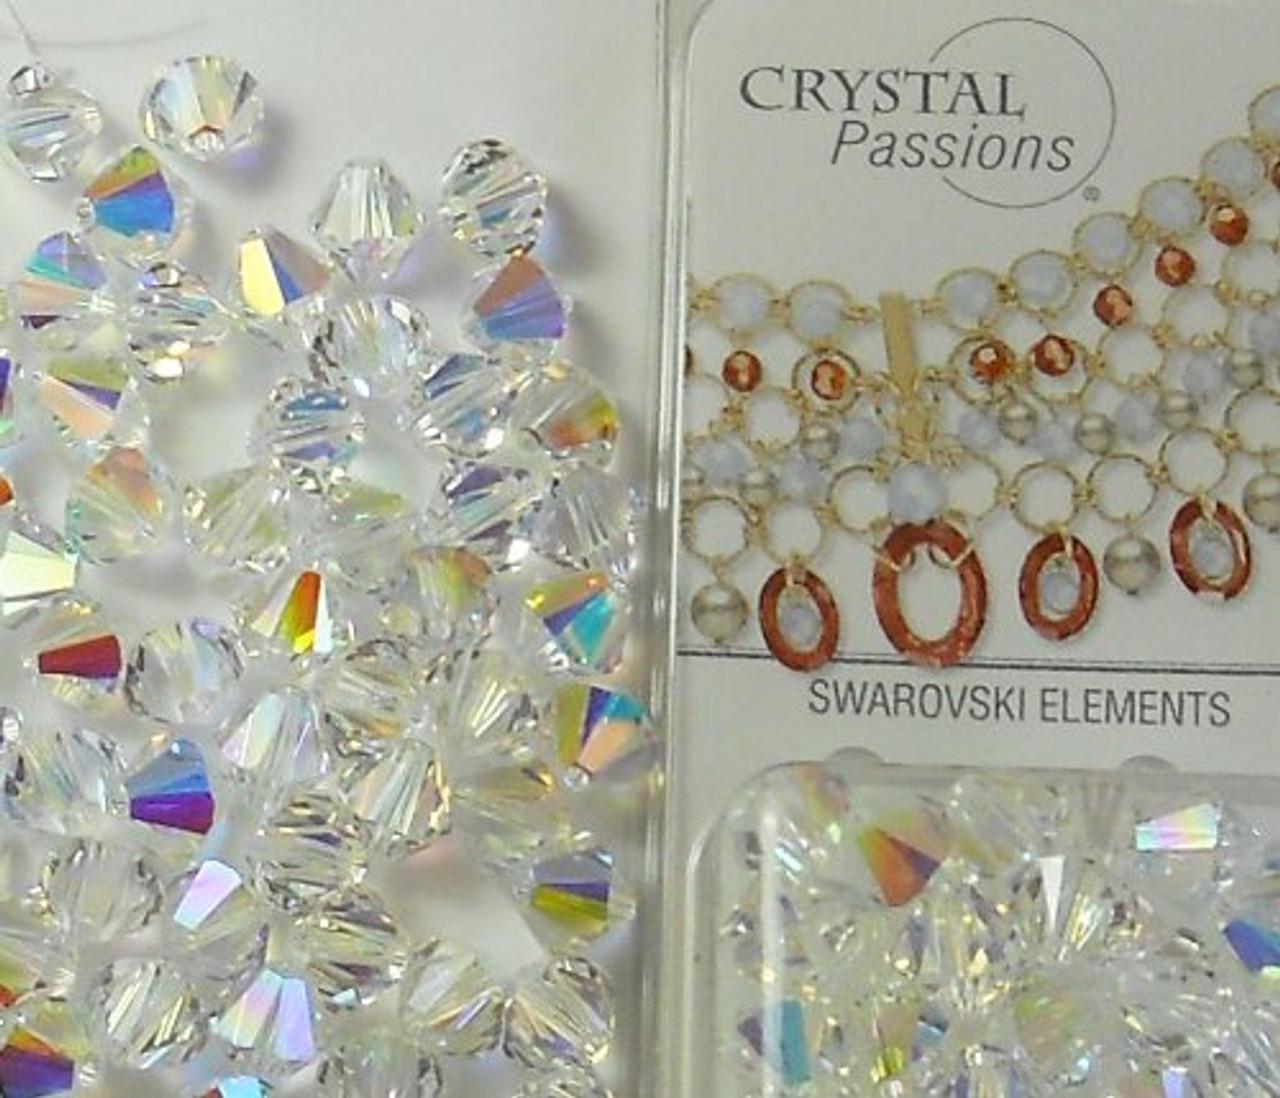 6mm Clear Ab Swarovski Bicone Beads xillian 144 Piece By Crystal Passions??  Distributor Of Sswarovski Elements Crystals Made In Austria xillion Cut ...